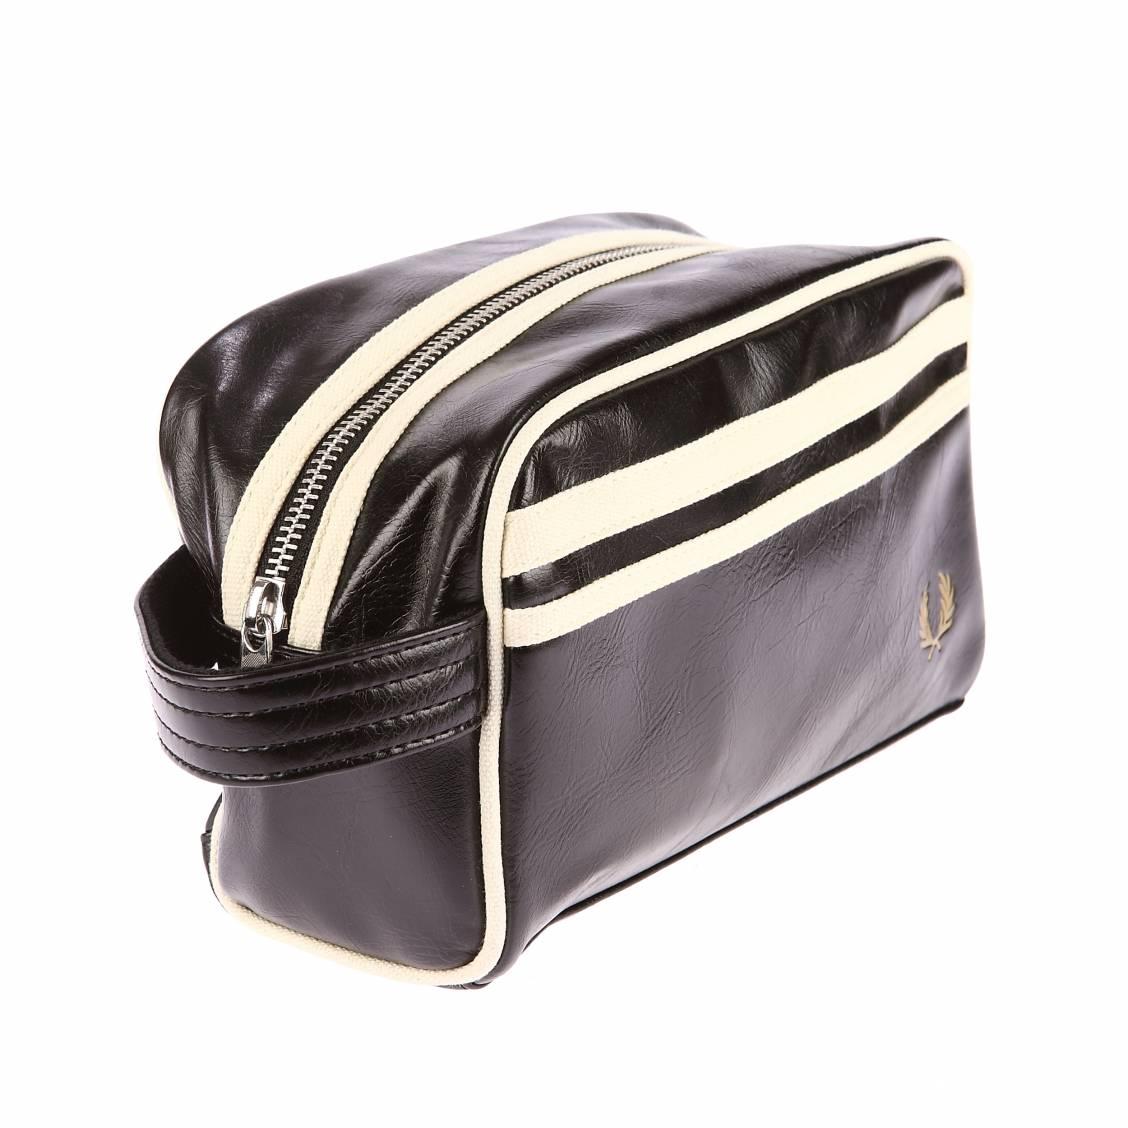 Trousse de toilette Fred Perry Classic Travel Kit Bag Black/Ecru noir jLYrDsLw3